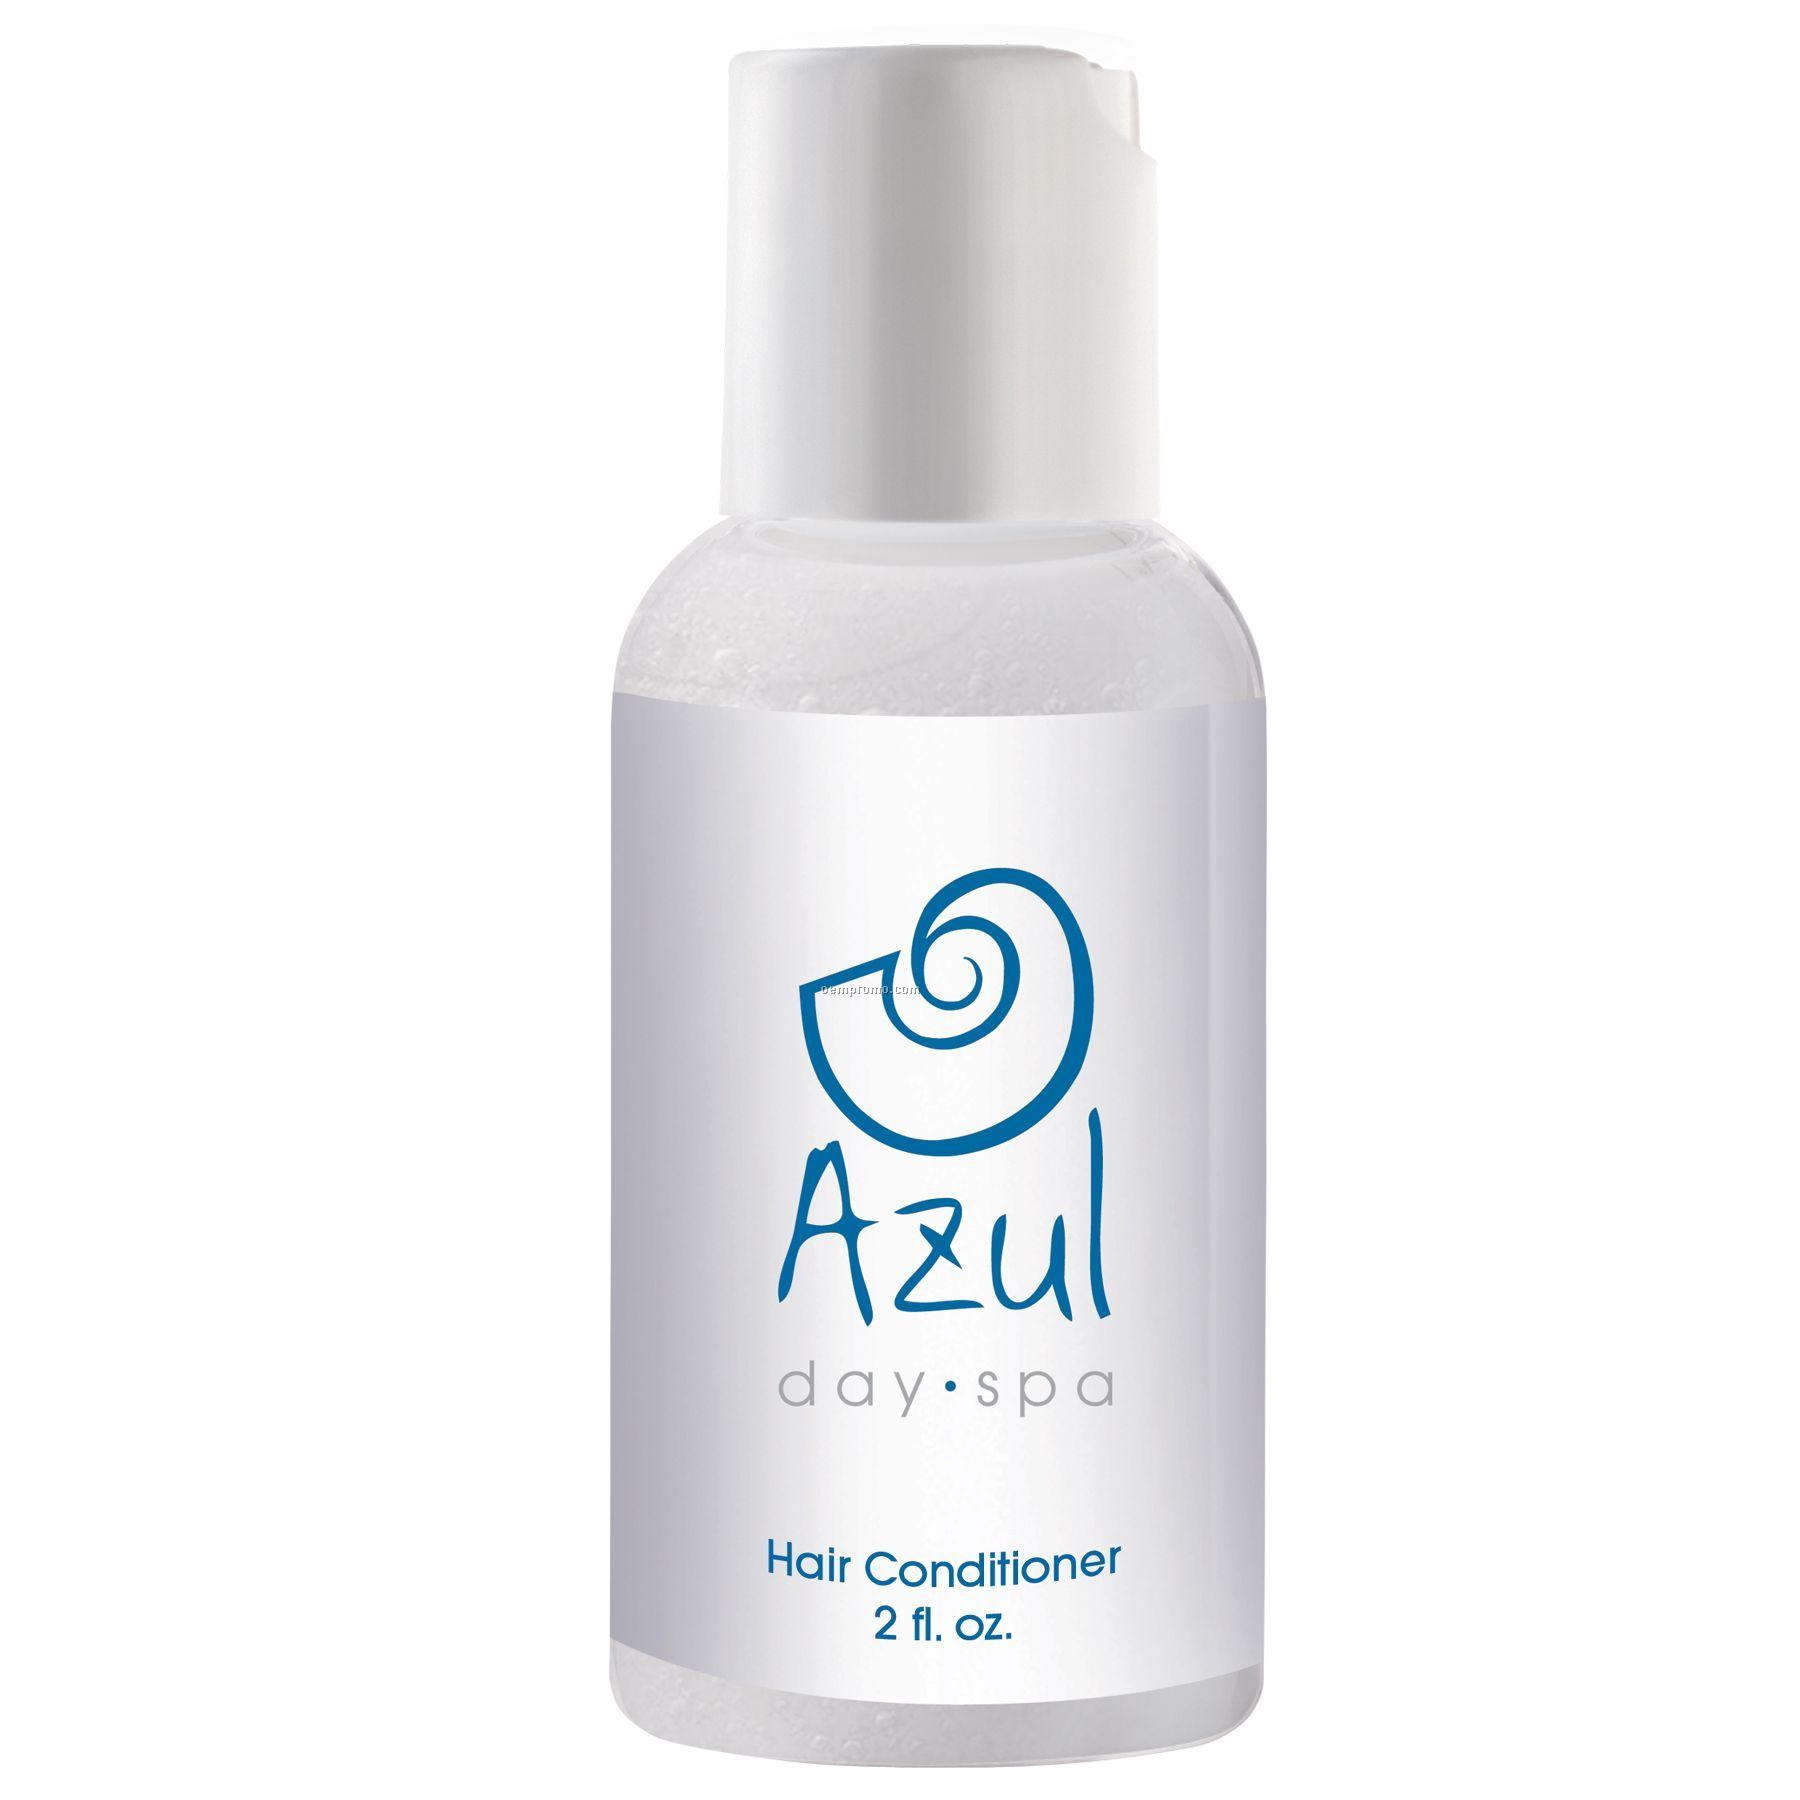 2 Oz. Hair Conditioner